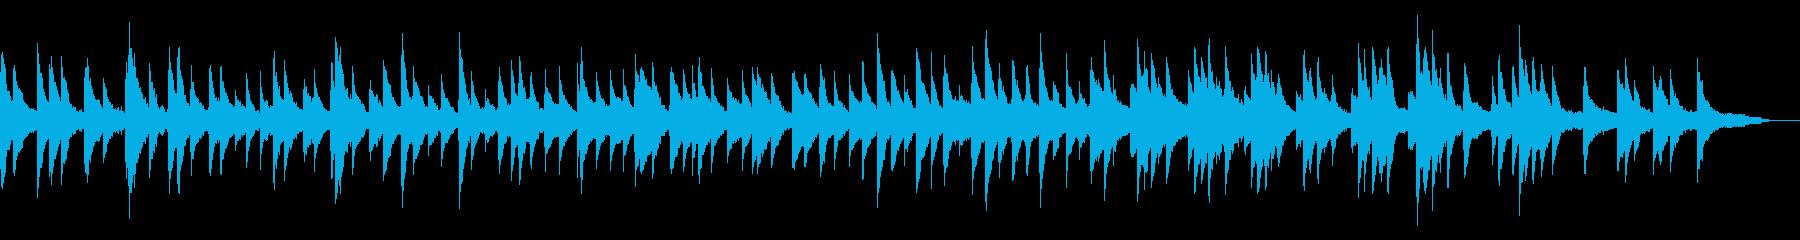 Cinematic Piano 10の再生済みの波形